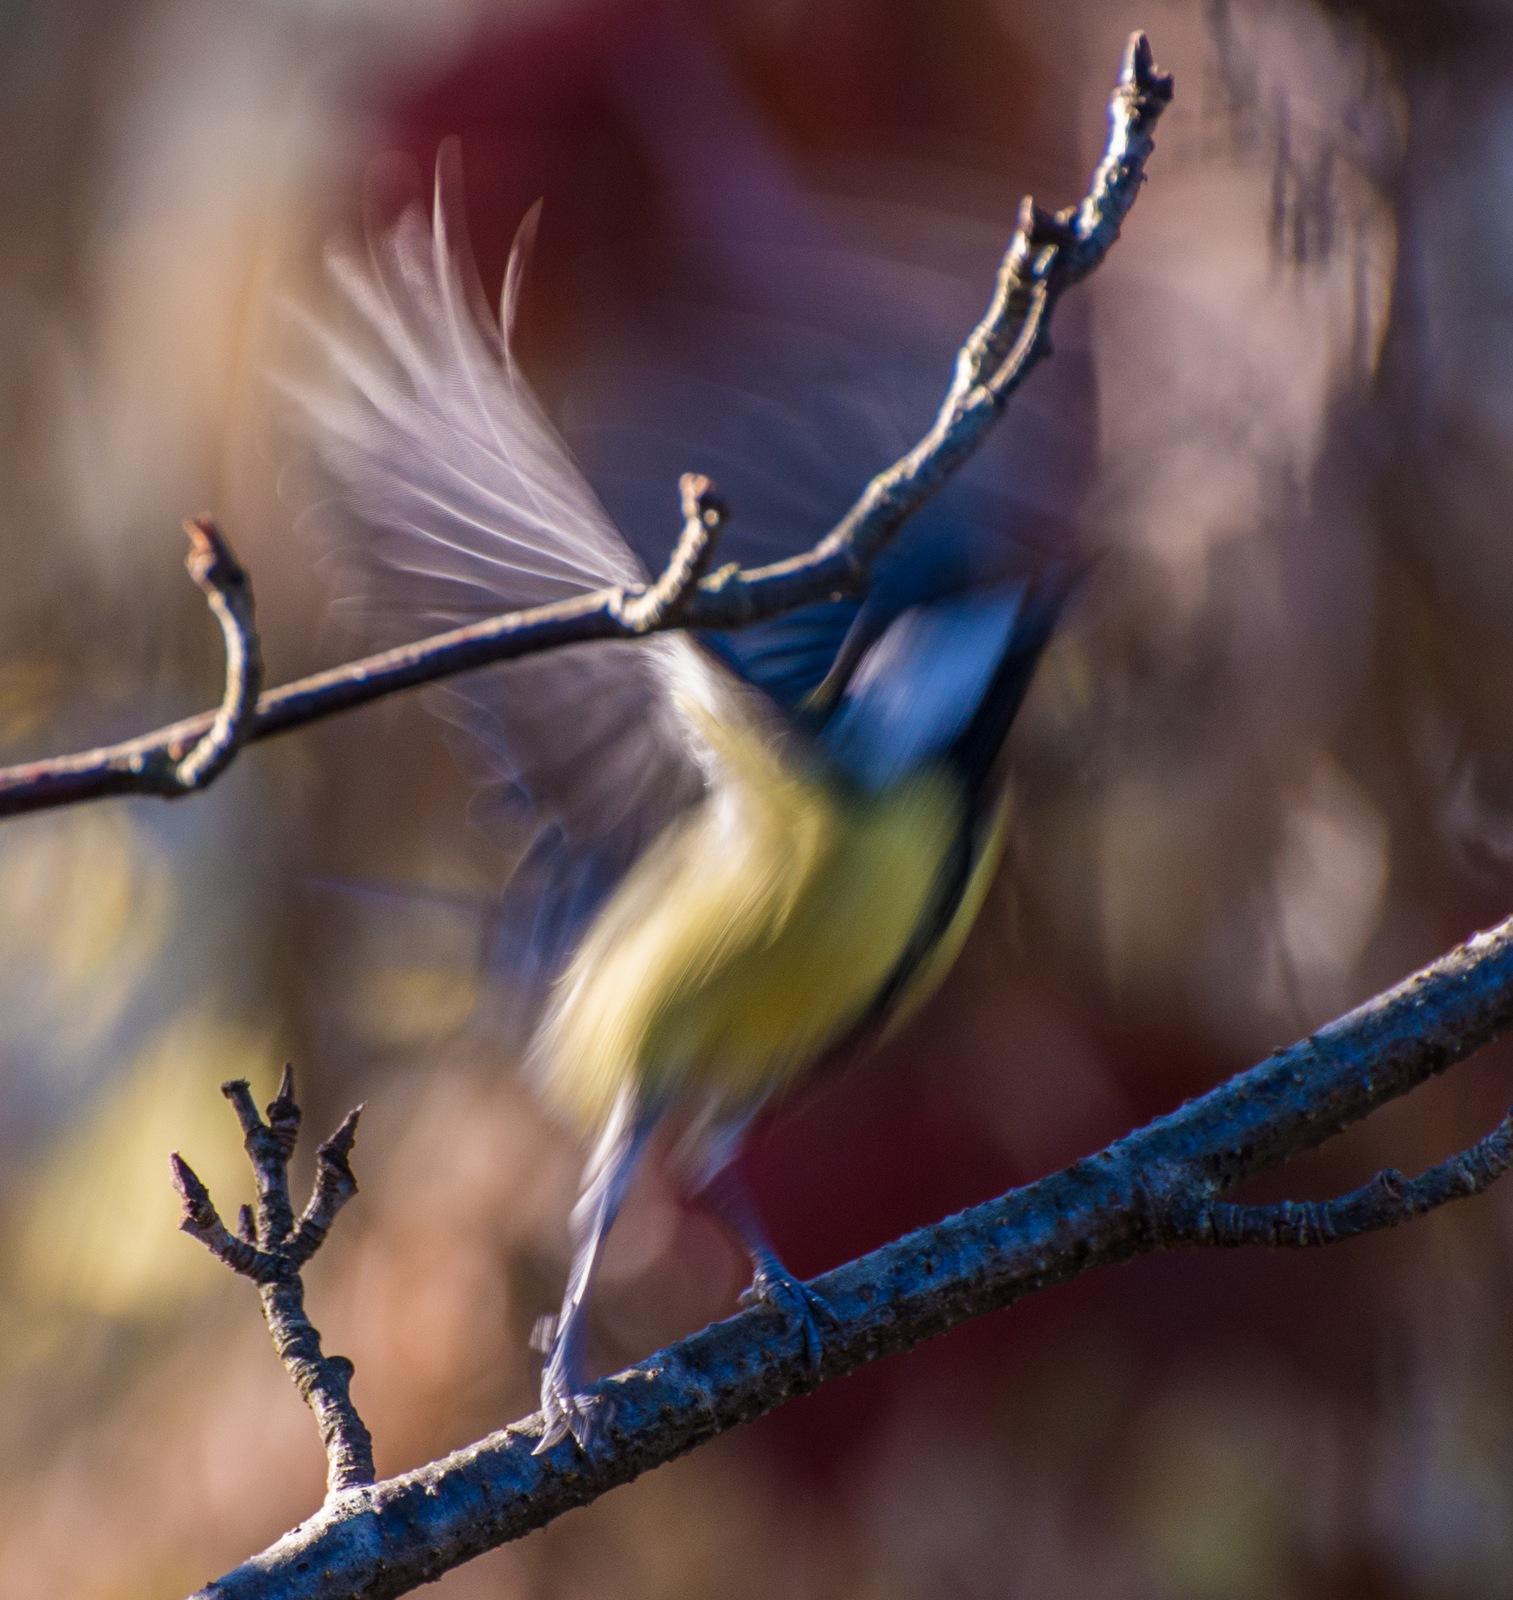 Fly by HeikkiHAtMAN PHOTOGRAPHY